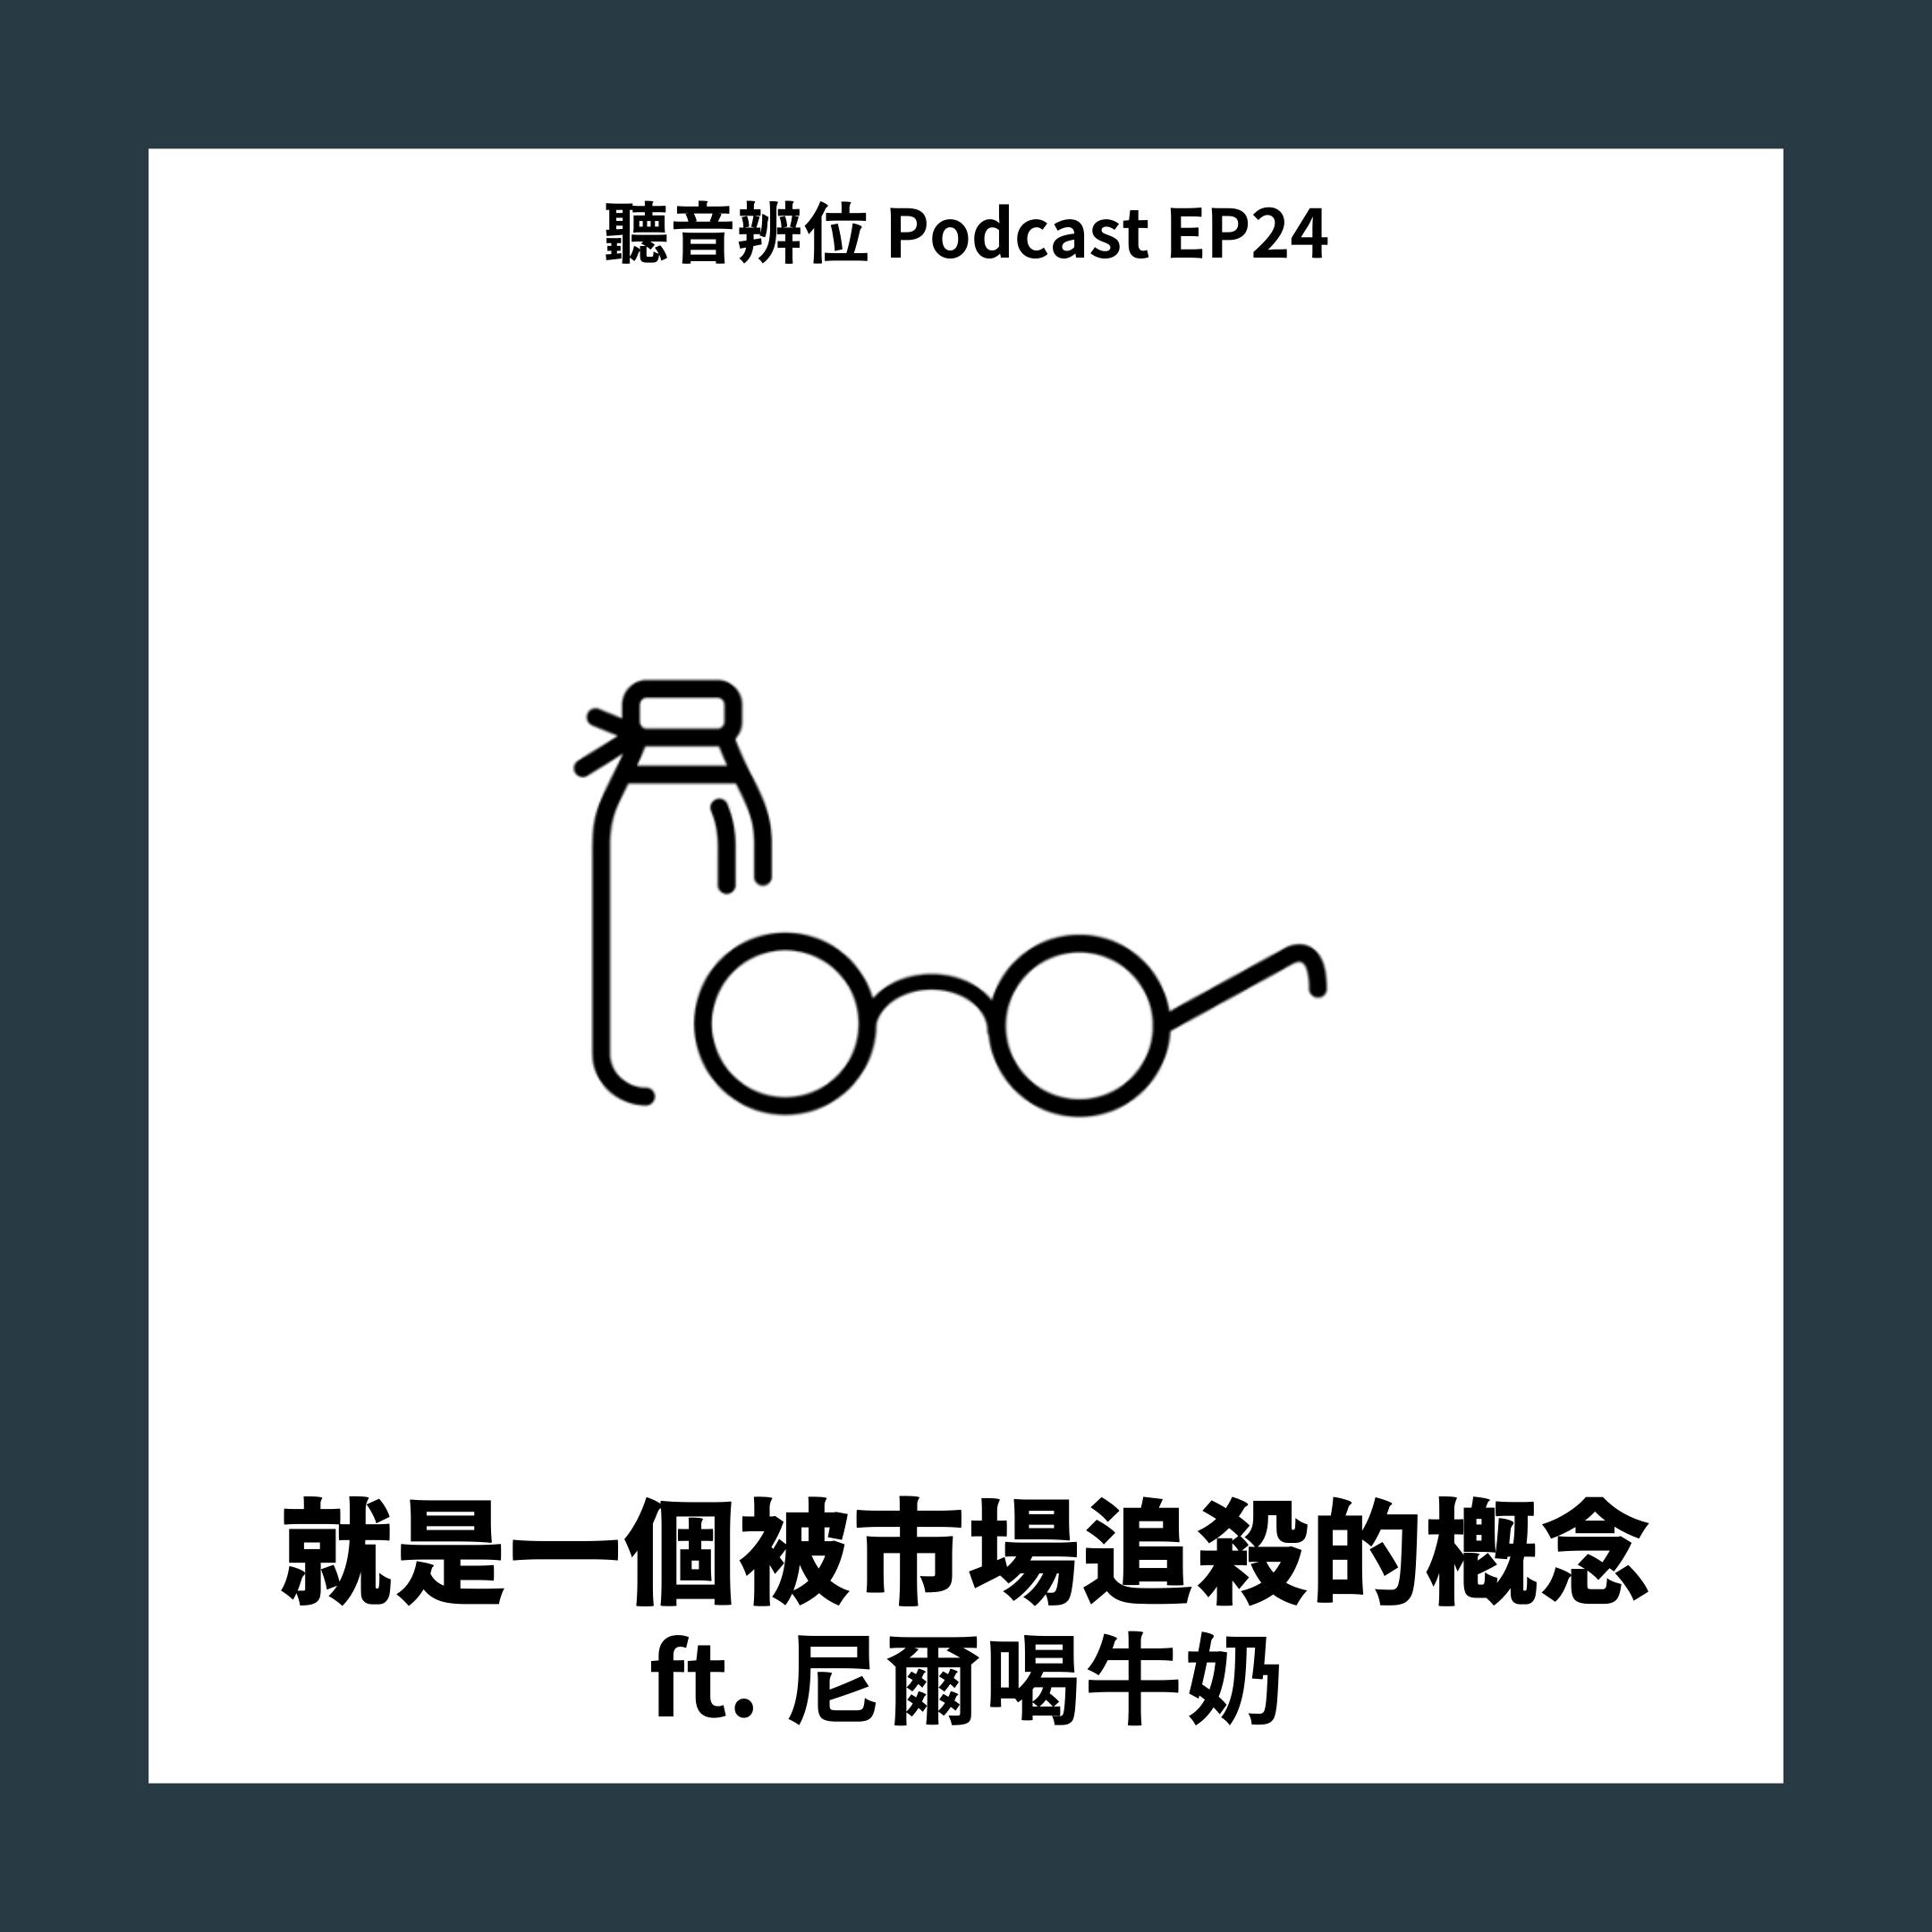 EP24 就是一個被市場追殺的概念 ft. 尼爾喝牛奶